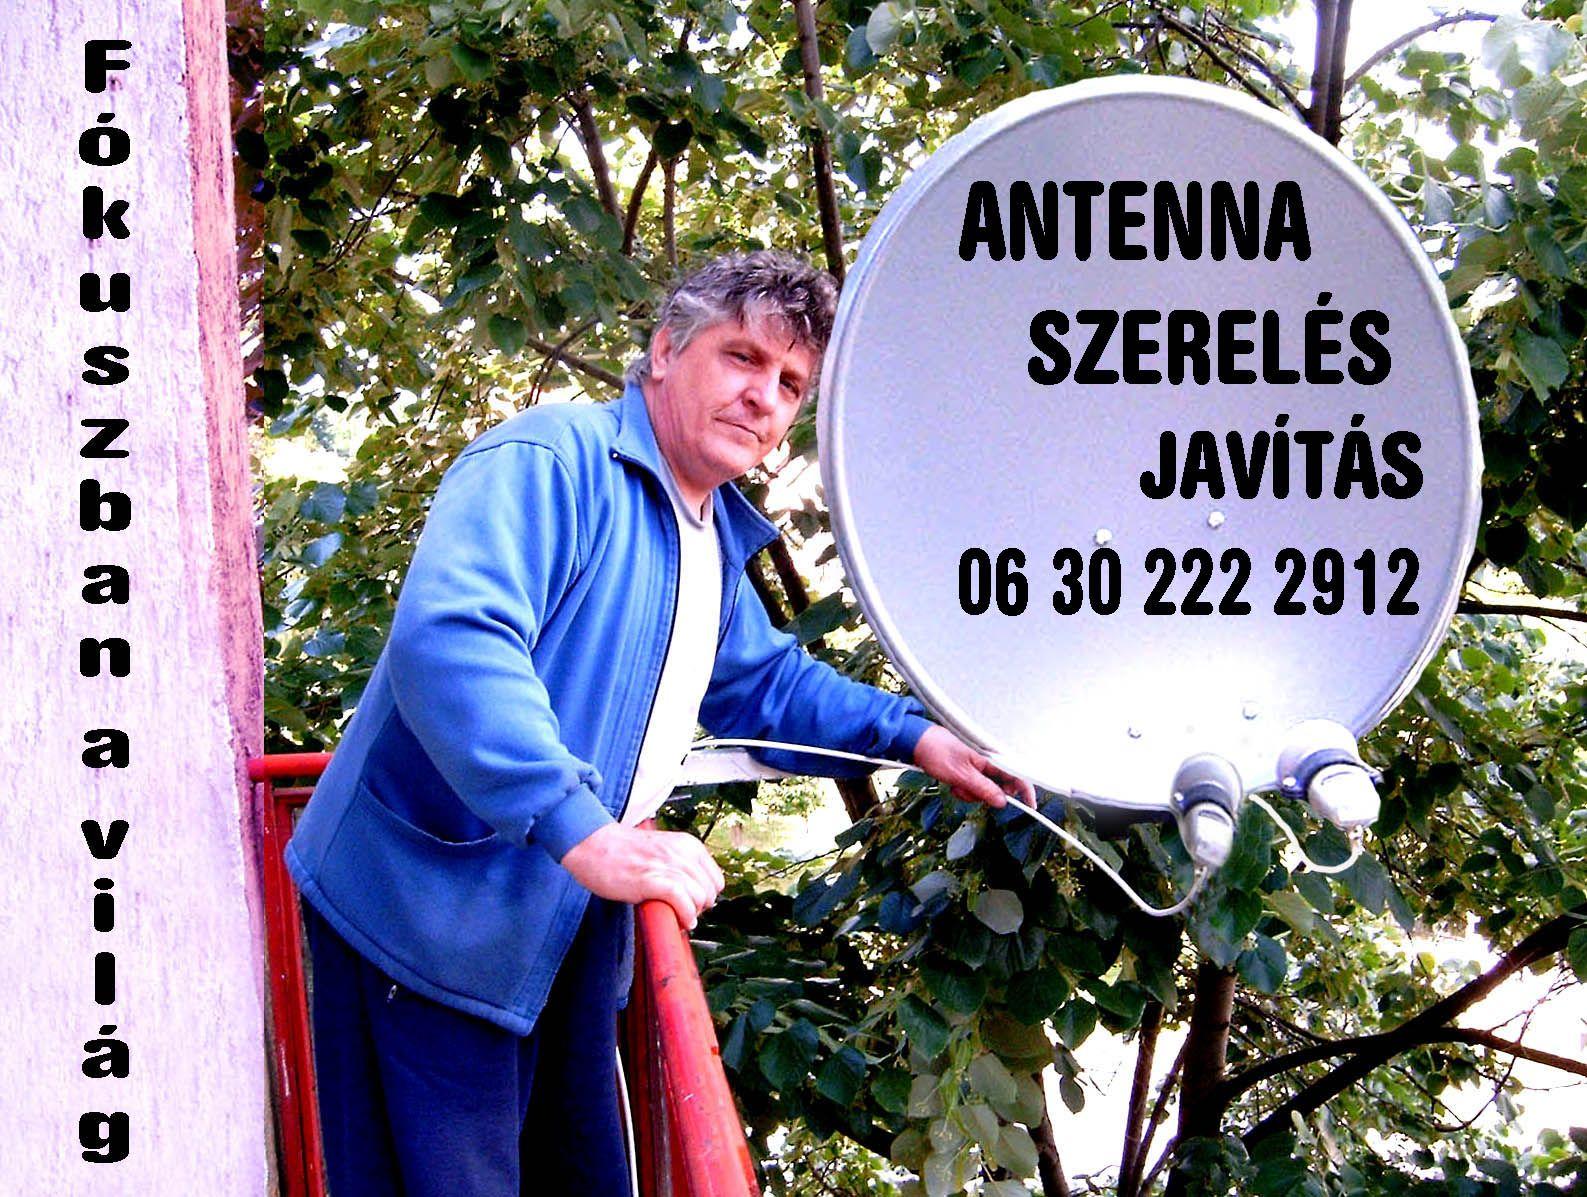 Antenna szerelés javitas